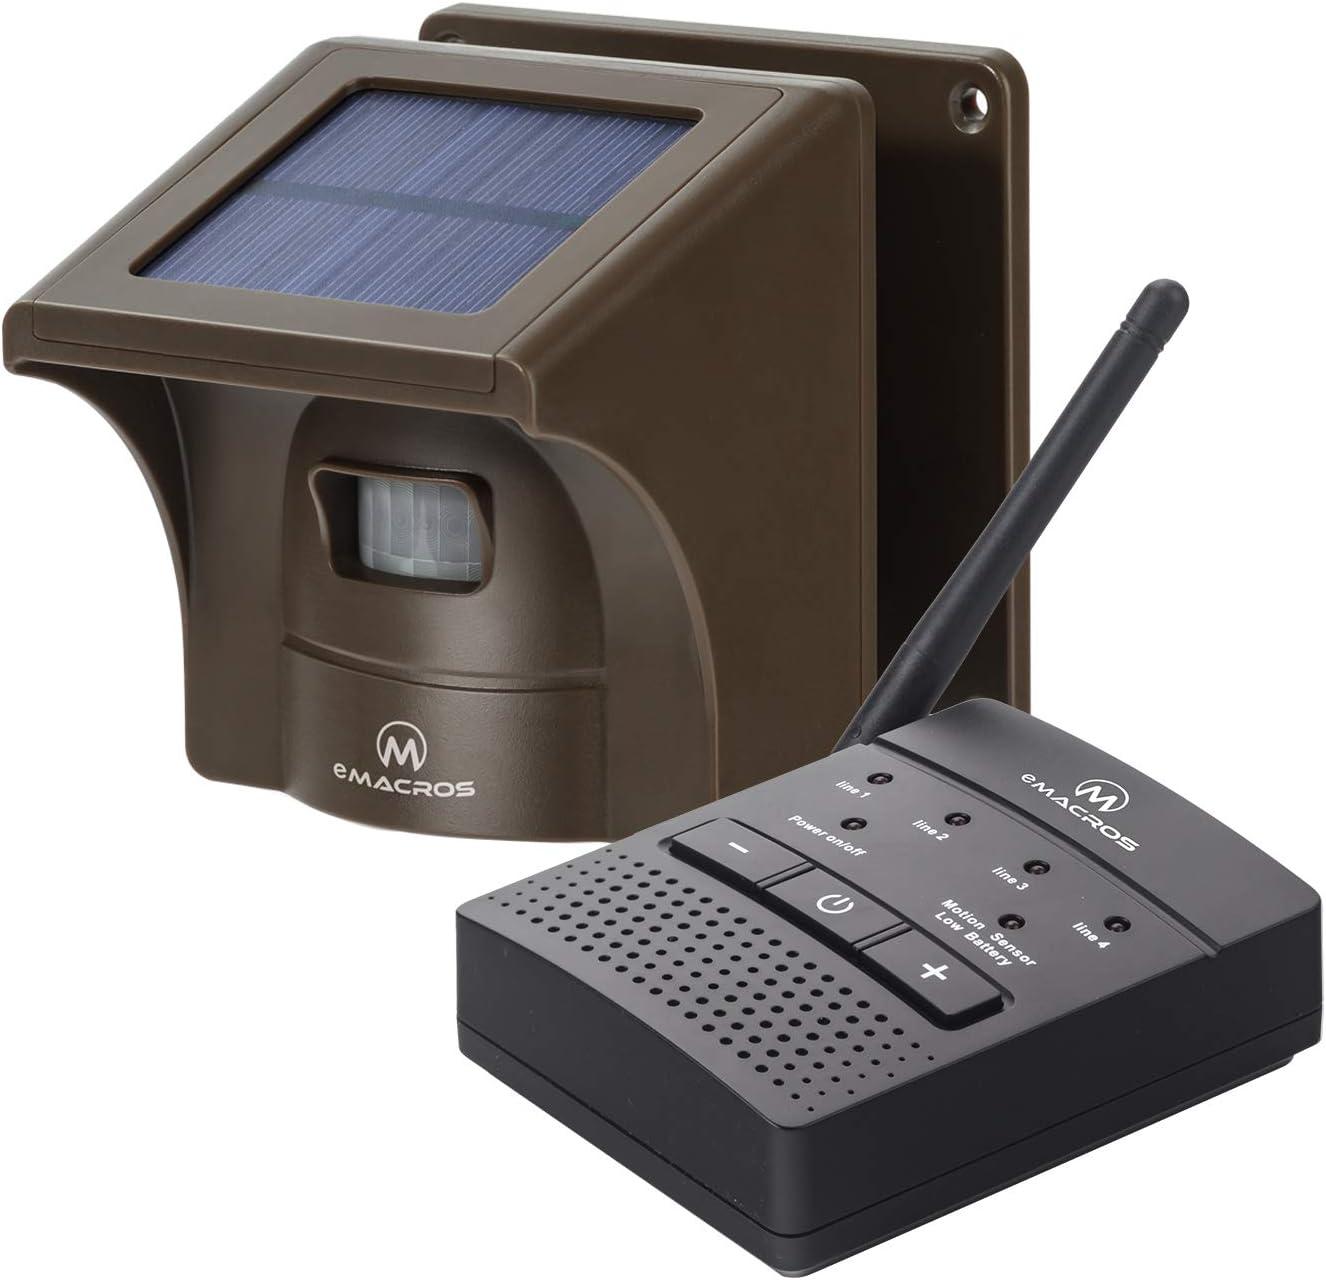 1/4 Mile Solar Driveway Alarm Sytem Wireless Long Range Outdoor Weather Resistant Motion Sensor & Detector- Driveway Alarms Wireless Outside Monitor & Protect